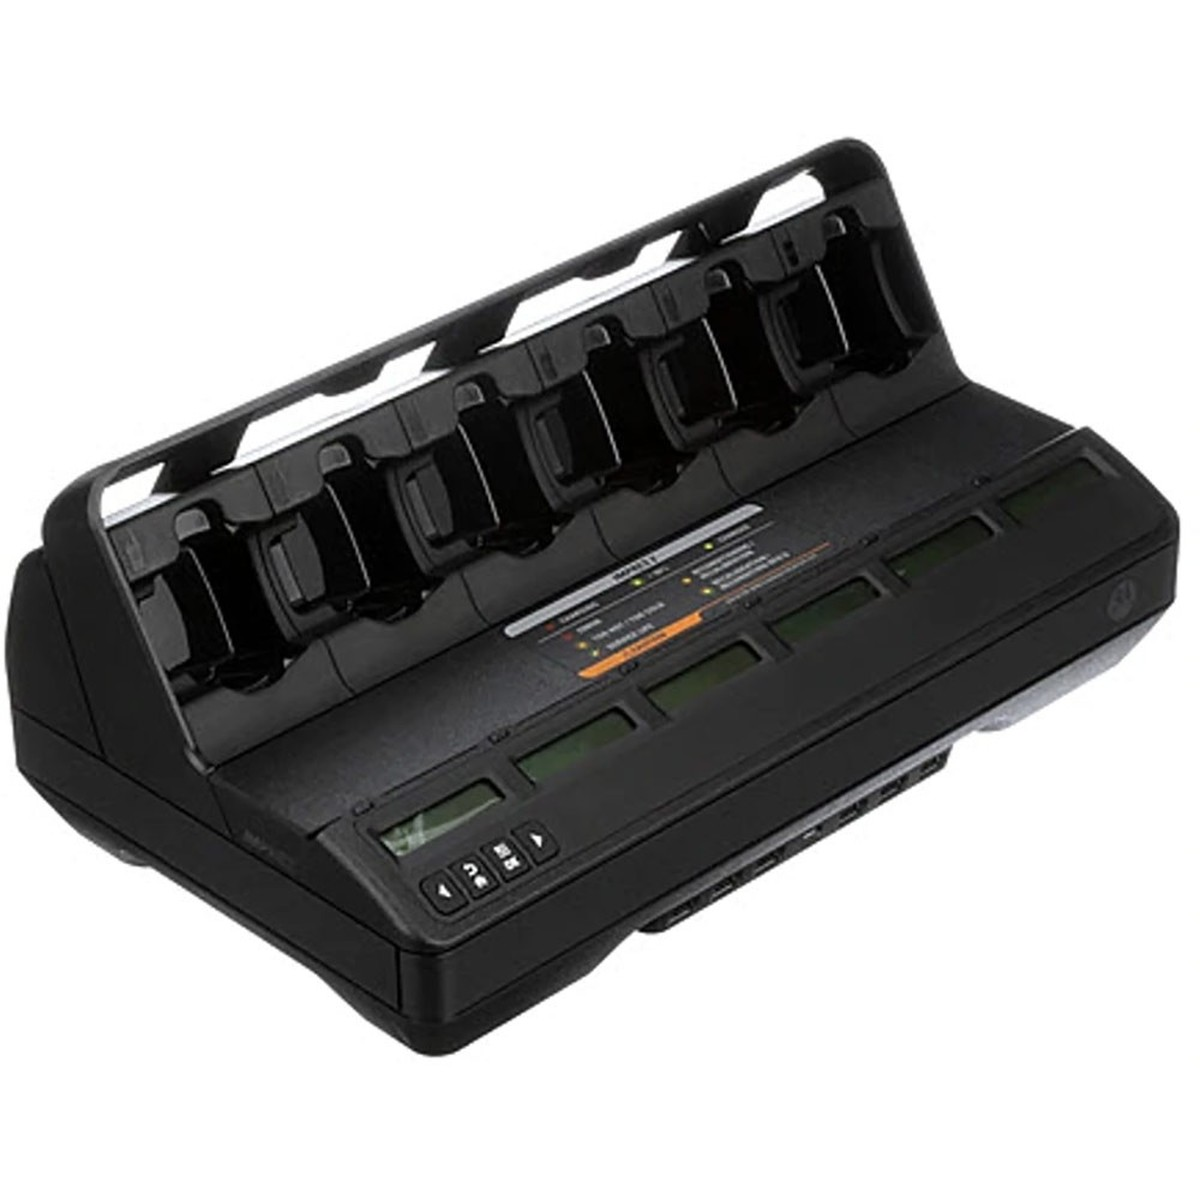 Cargador múltiple Motorola NNTN8844A para radios APX 8000